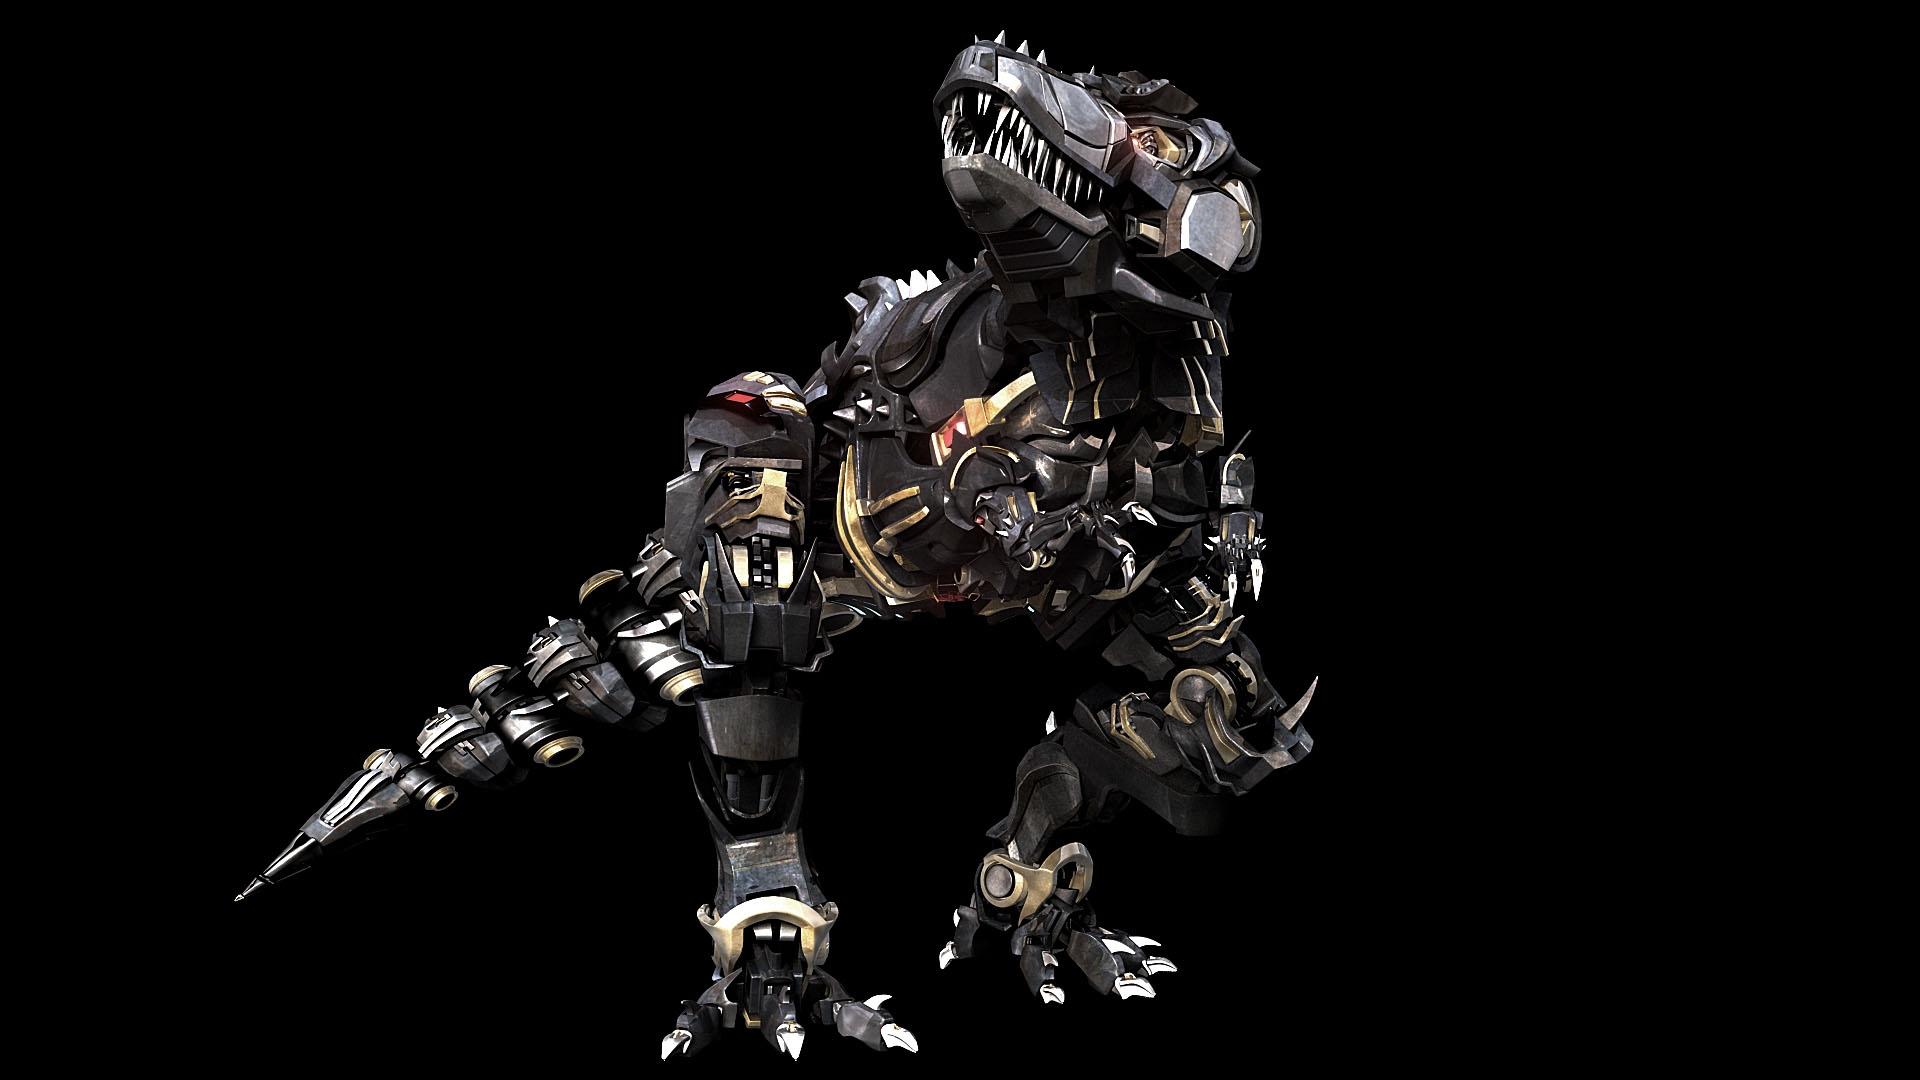 transformers 4 grimlock dinobots free hd